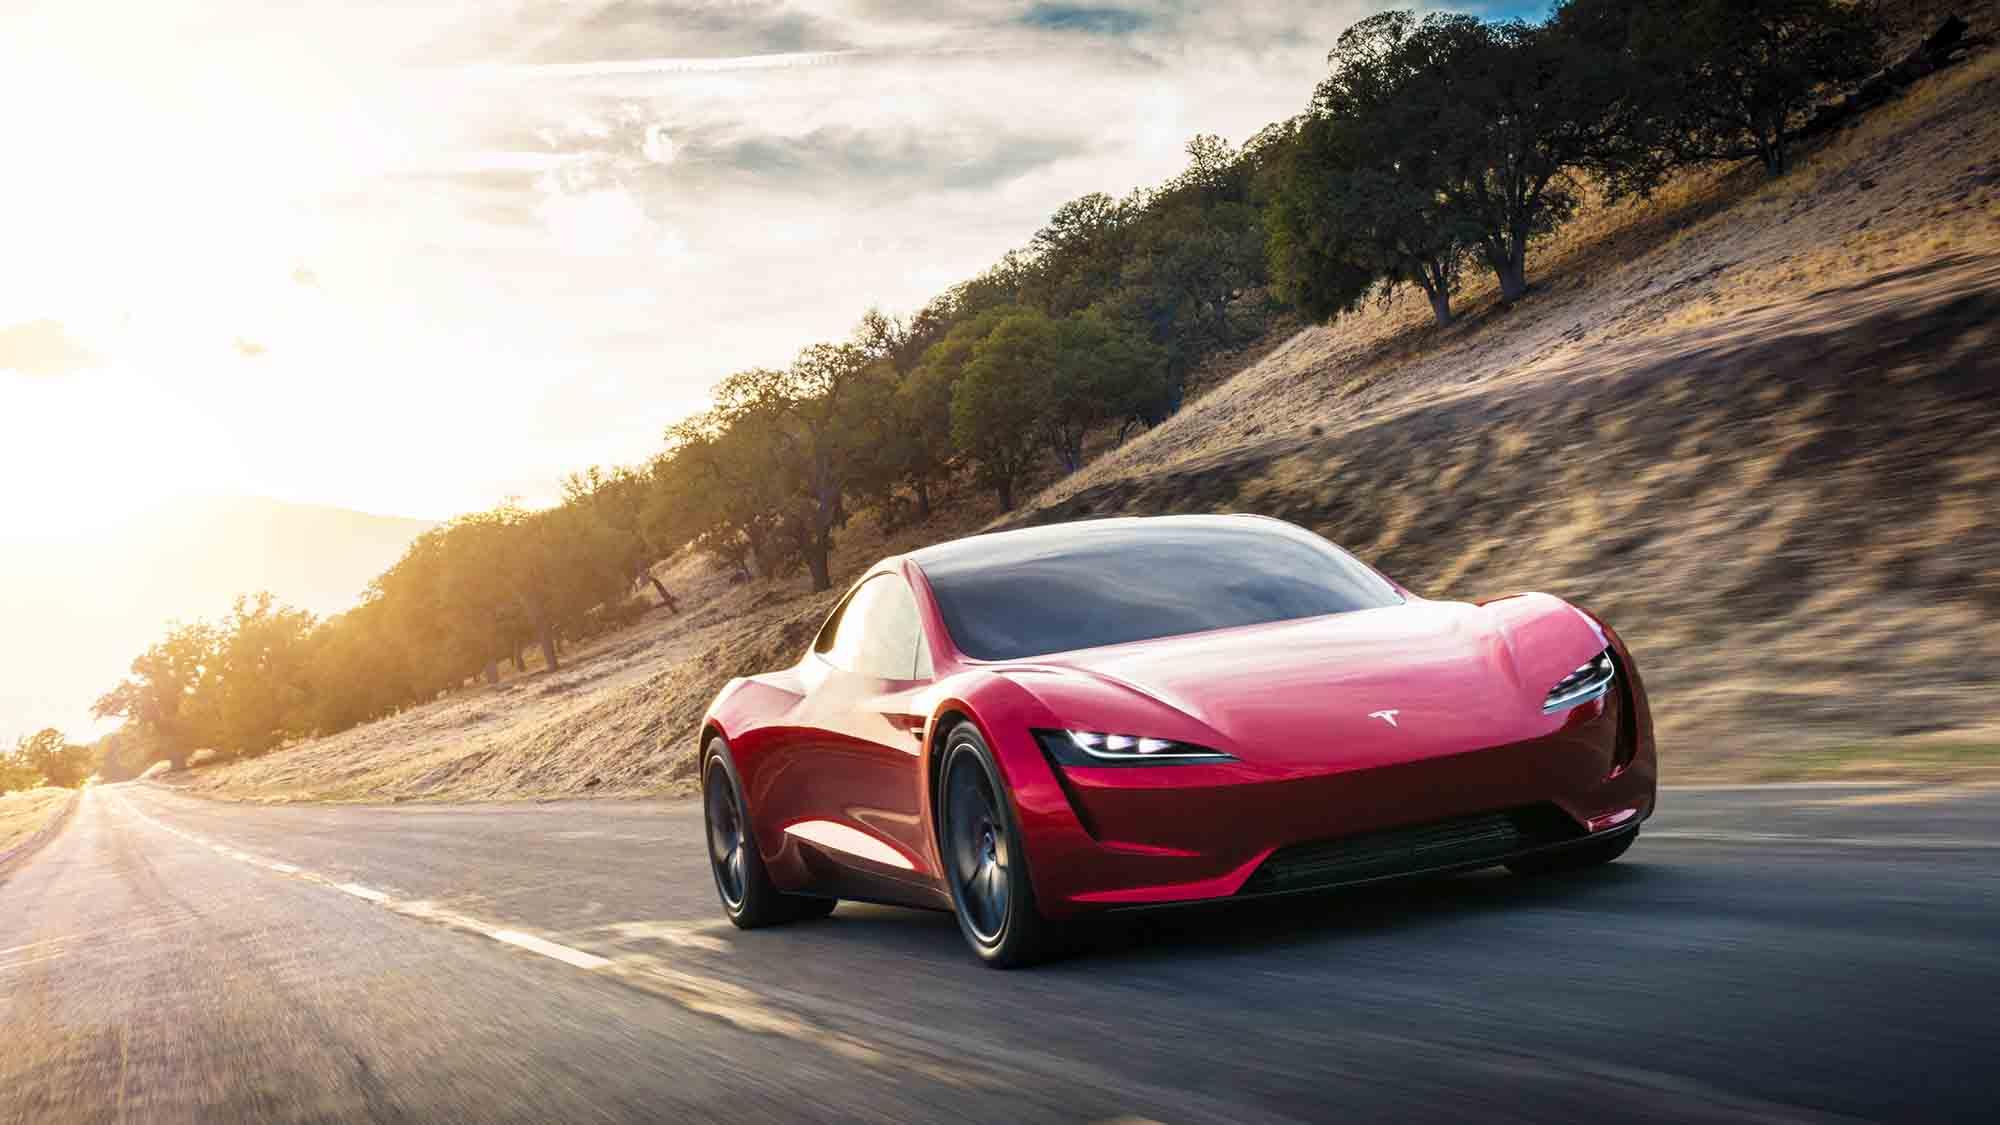 https://static.tildacdn.com/tild3431-6237-4665-b931-643835653831/Tesla_Roadster1.jpg